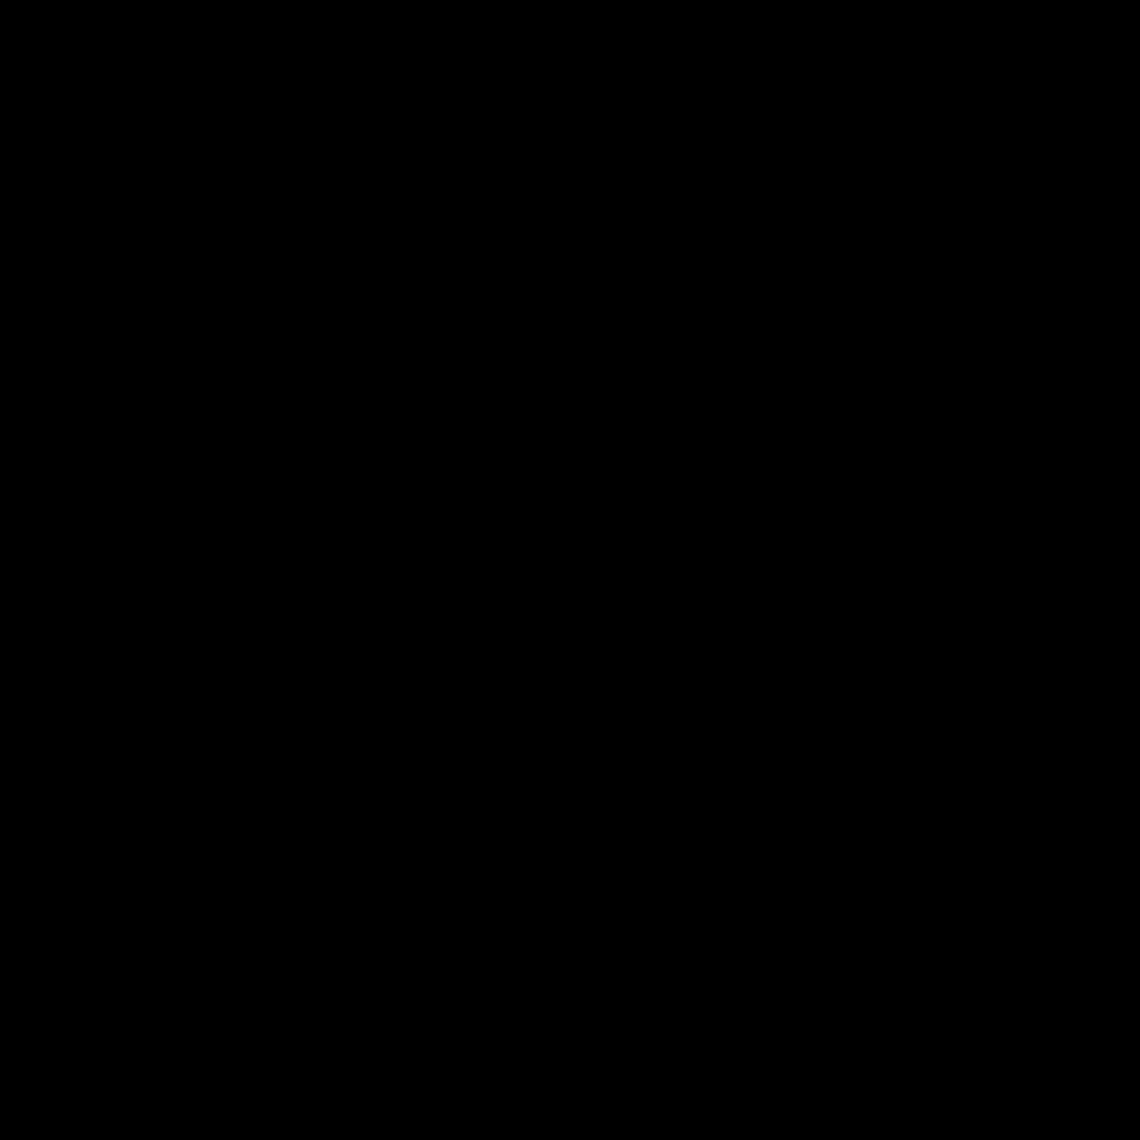 20200705_130258